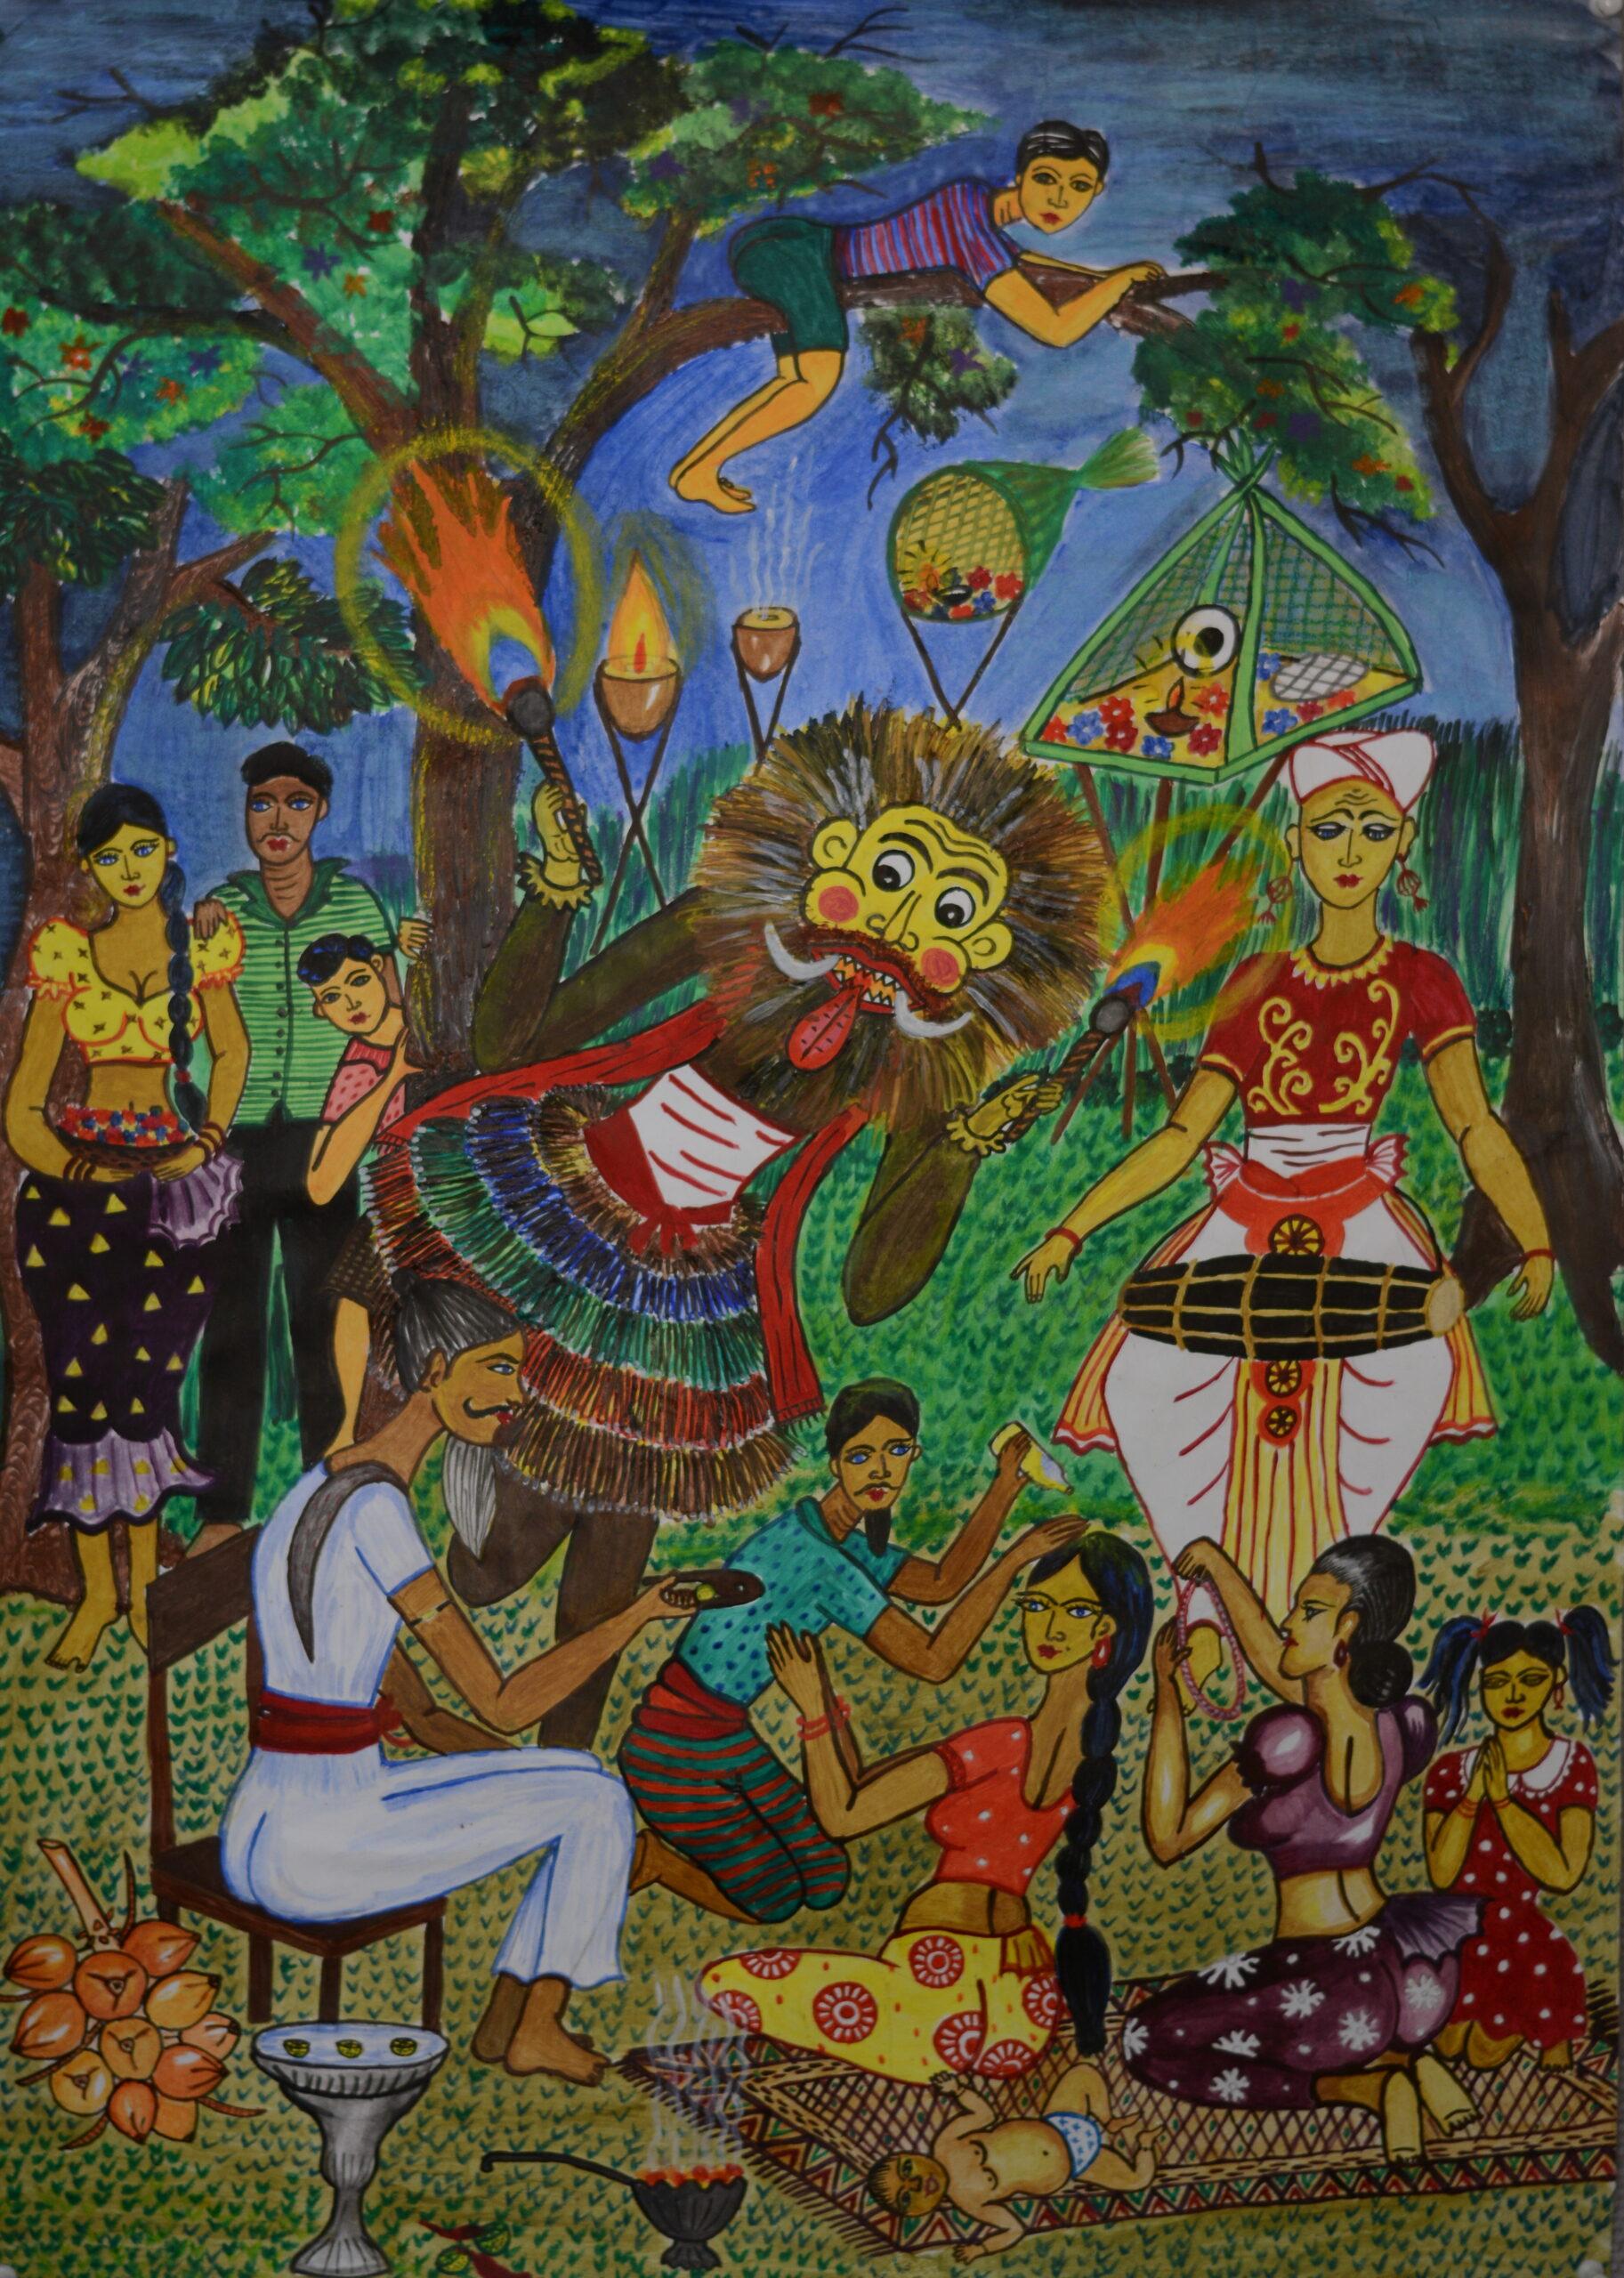 Traditions ceremonial events (Offering to Gods)_V. A. Dilshi Mayushani Vengappuli Arachchi